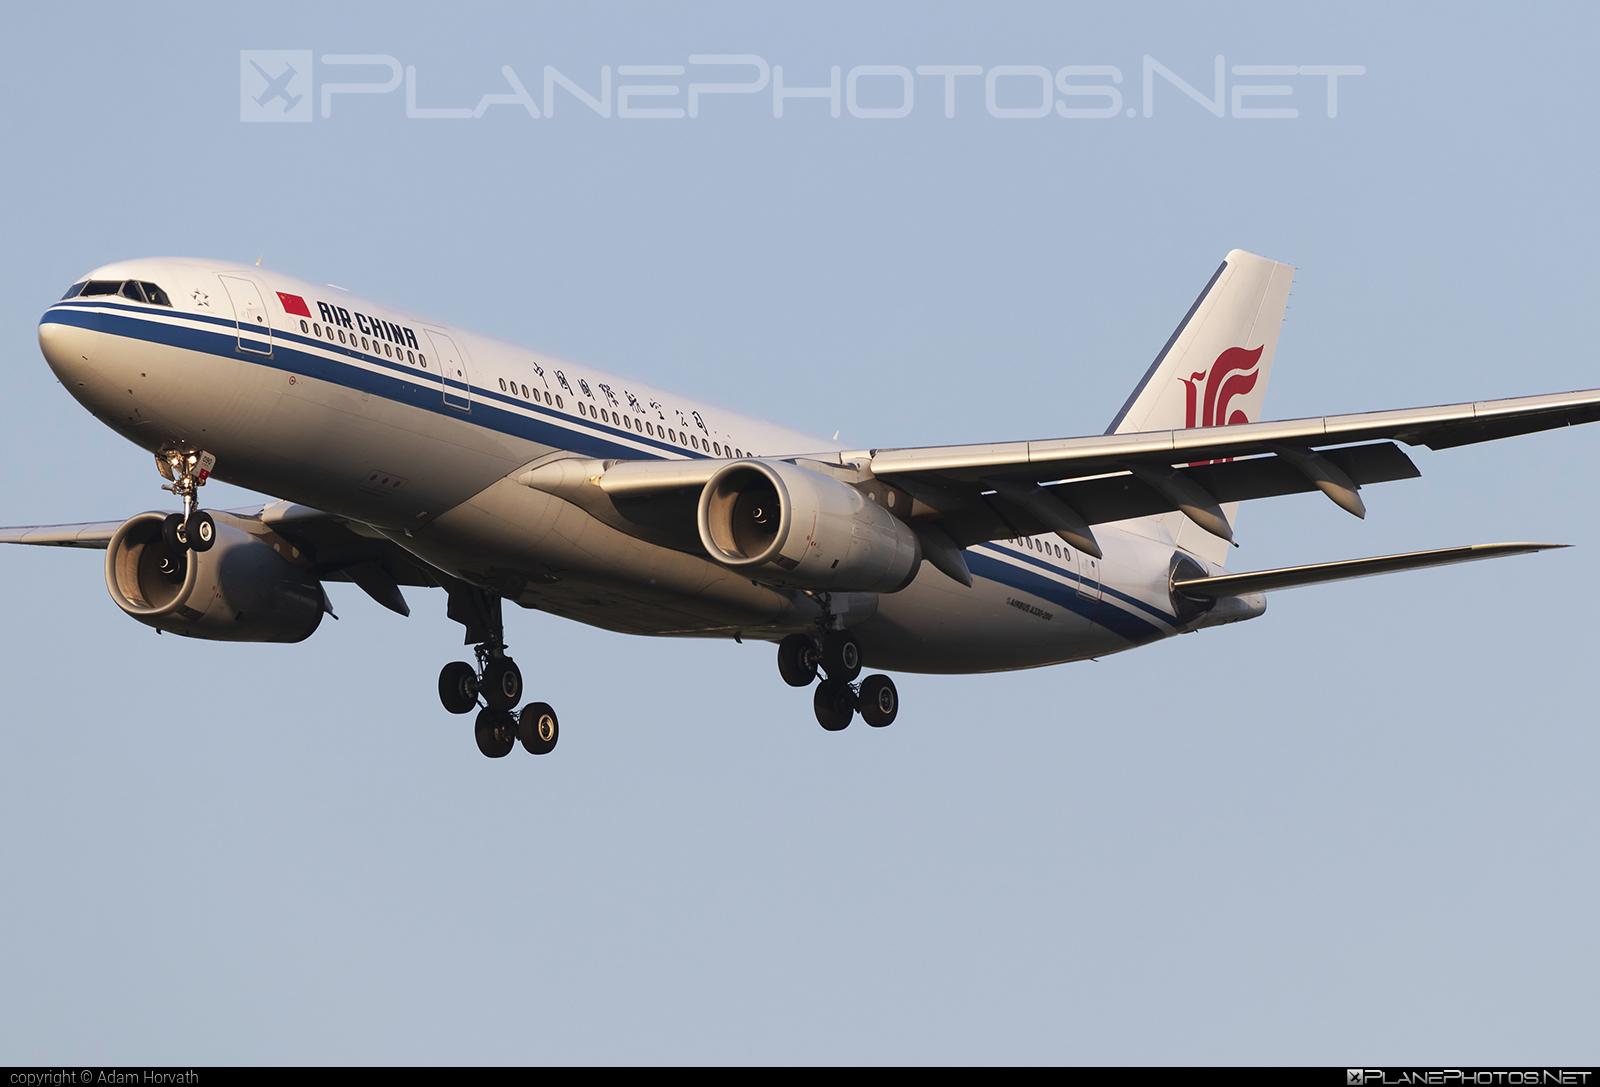 Airbus A330-243 - B-6090 operated by Air China #a330 #a330family #airbus #airbus330 #airchina